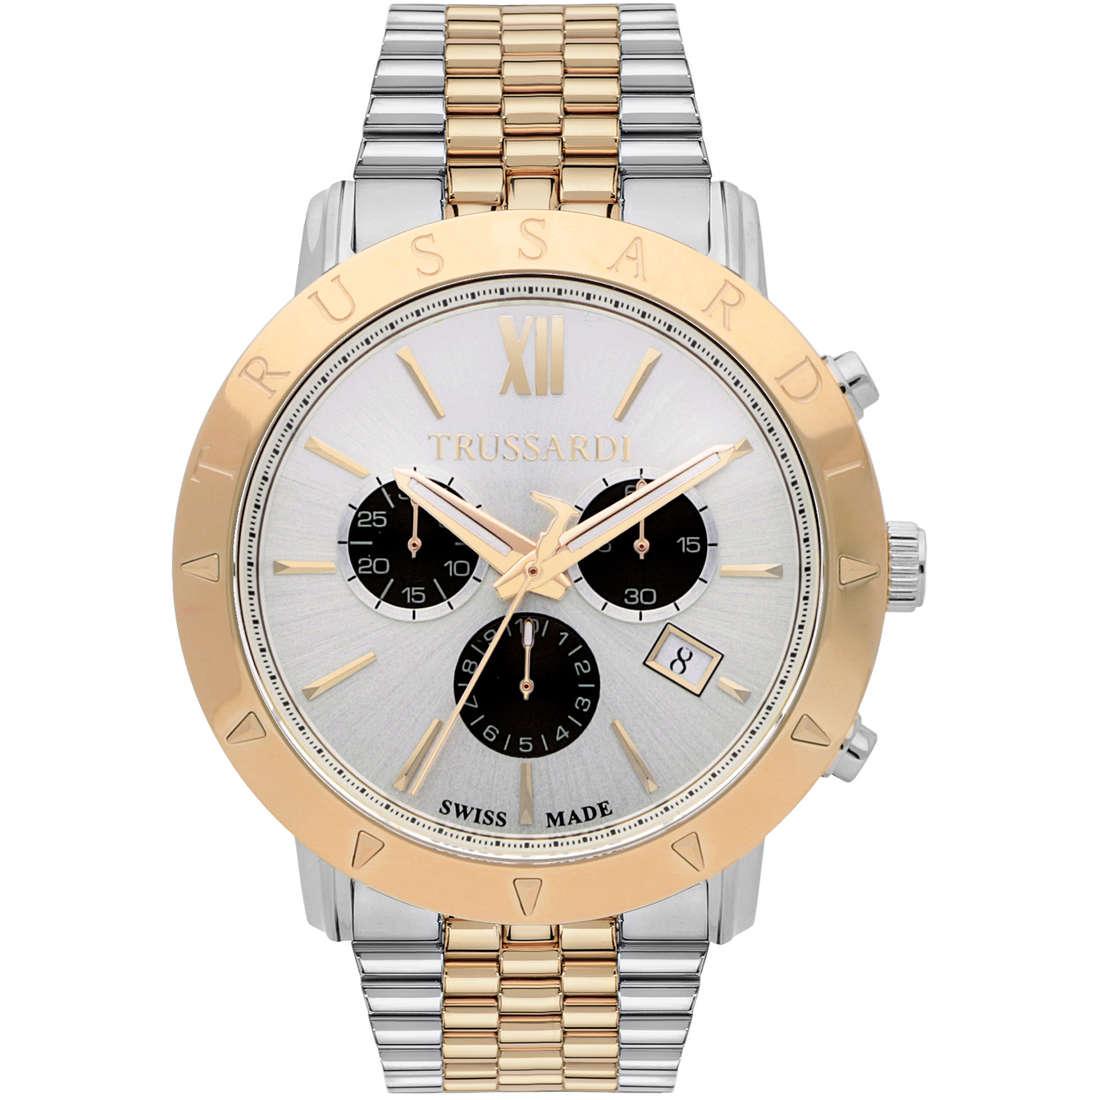 orologio cronografo uomo Trussardi Nestor R2473607001